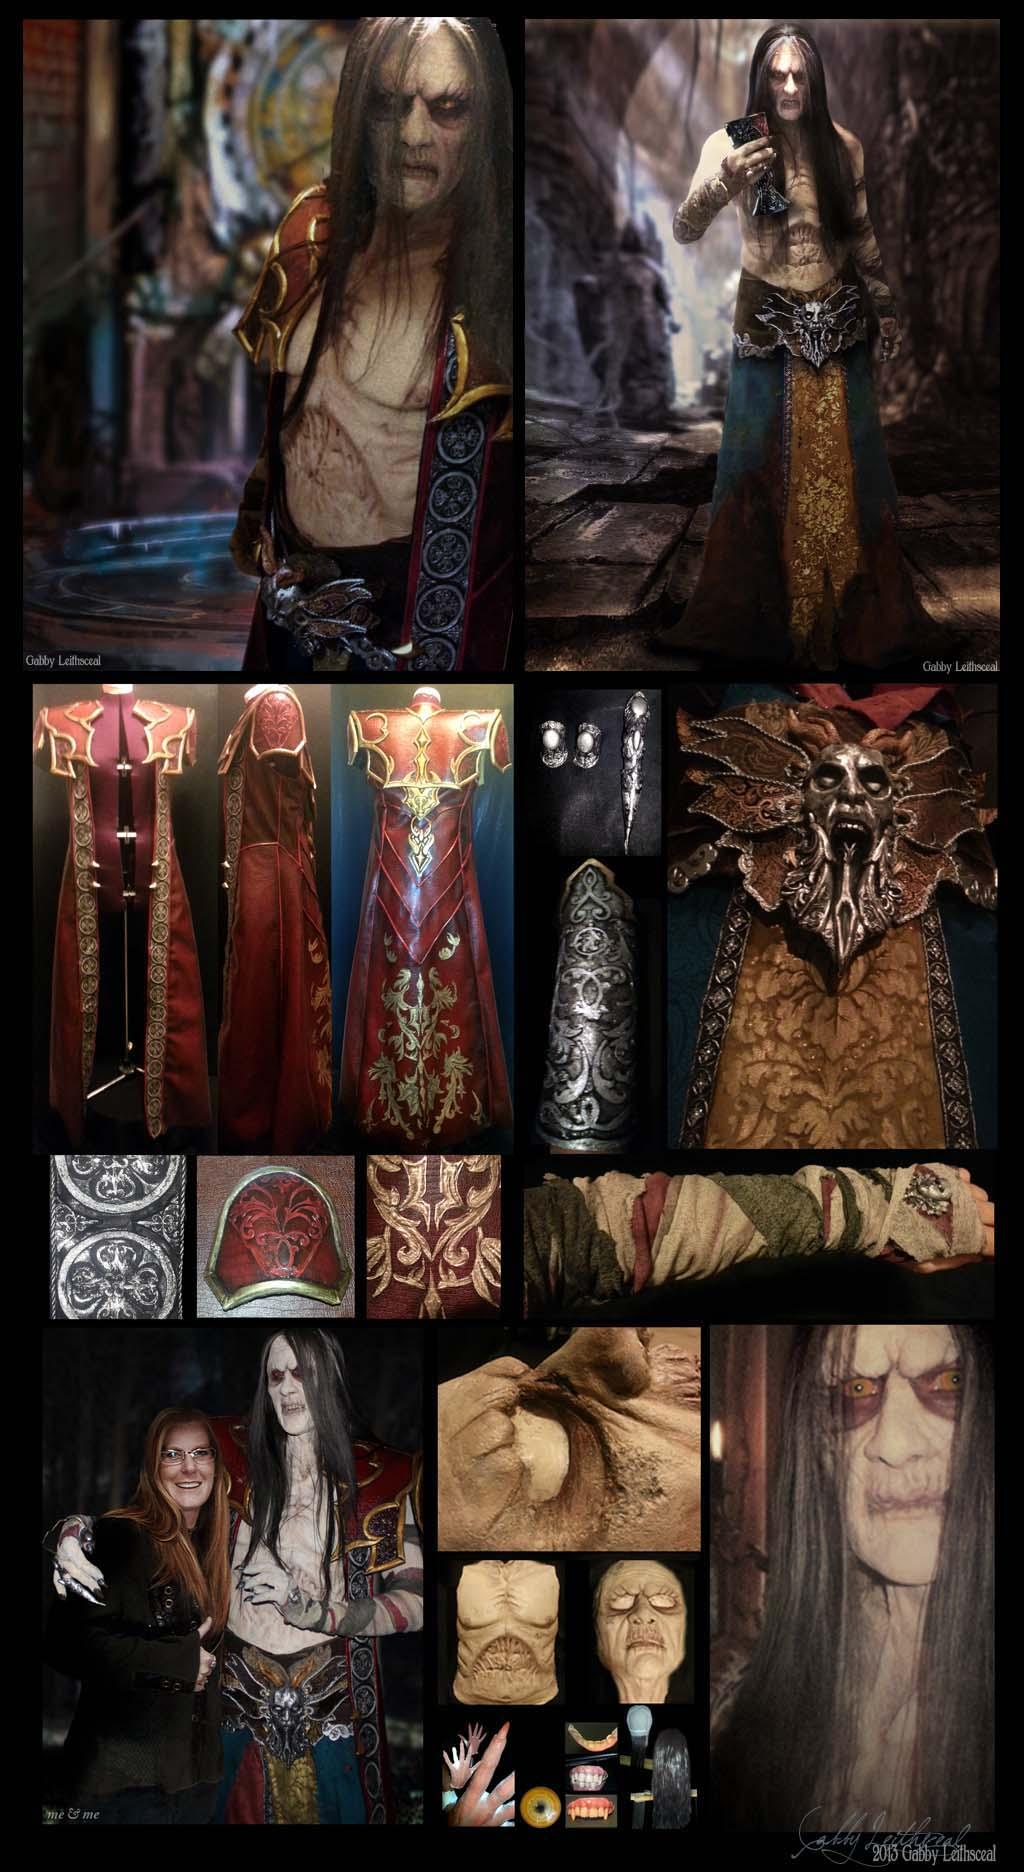 Gabriel Belmont (Dracula) Cosplay by GabbyLeithsceal